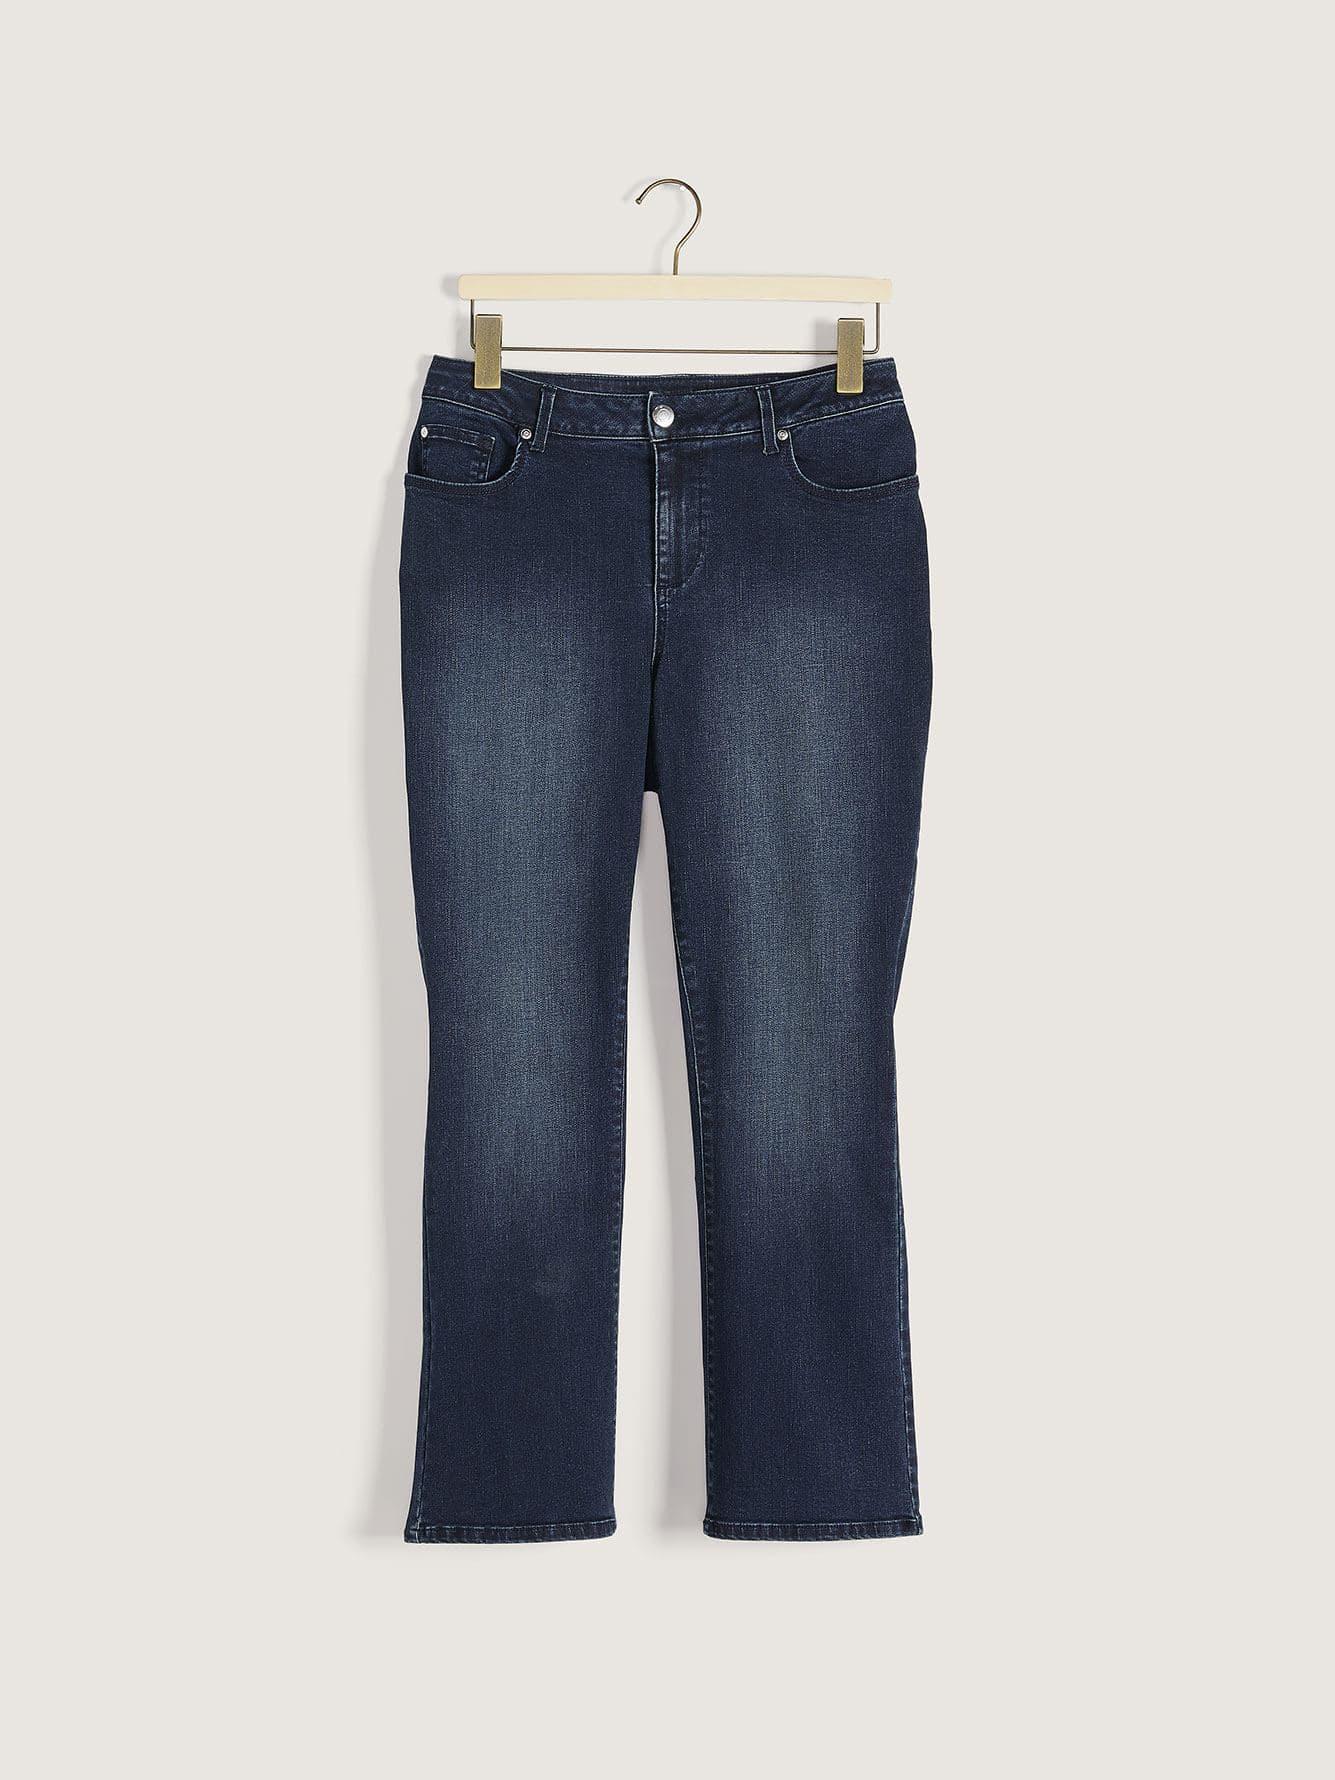 Universal Fit, Dark Blue Bootcut Jean - d/C JEANS